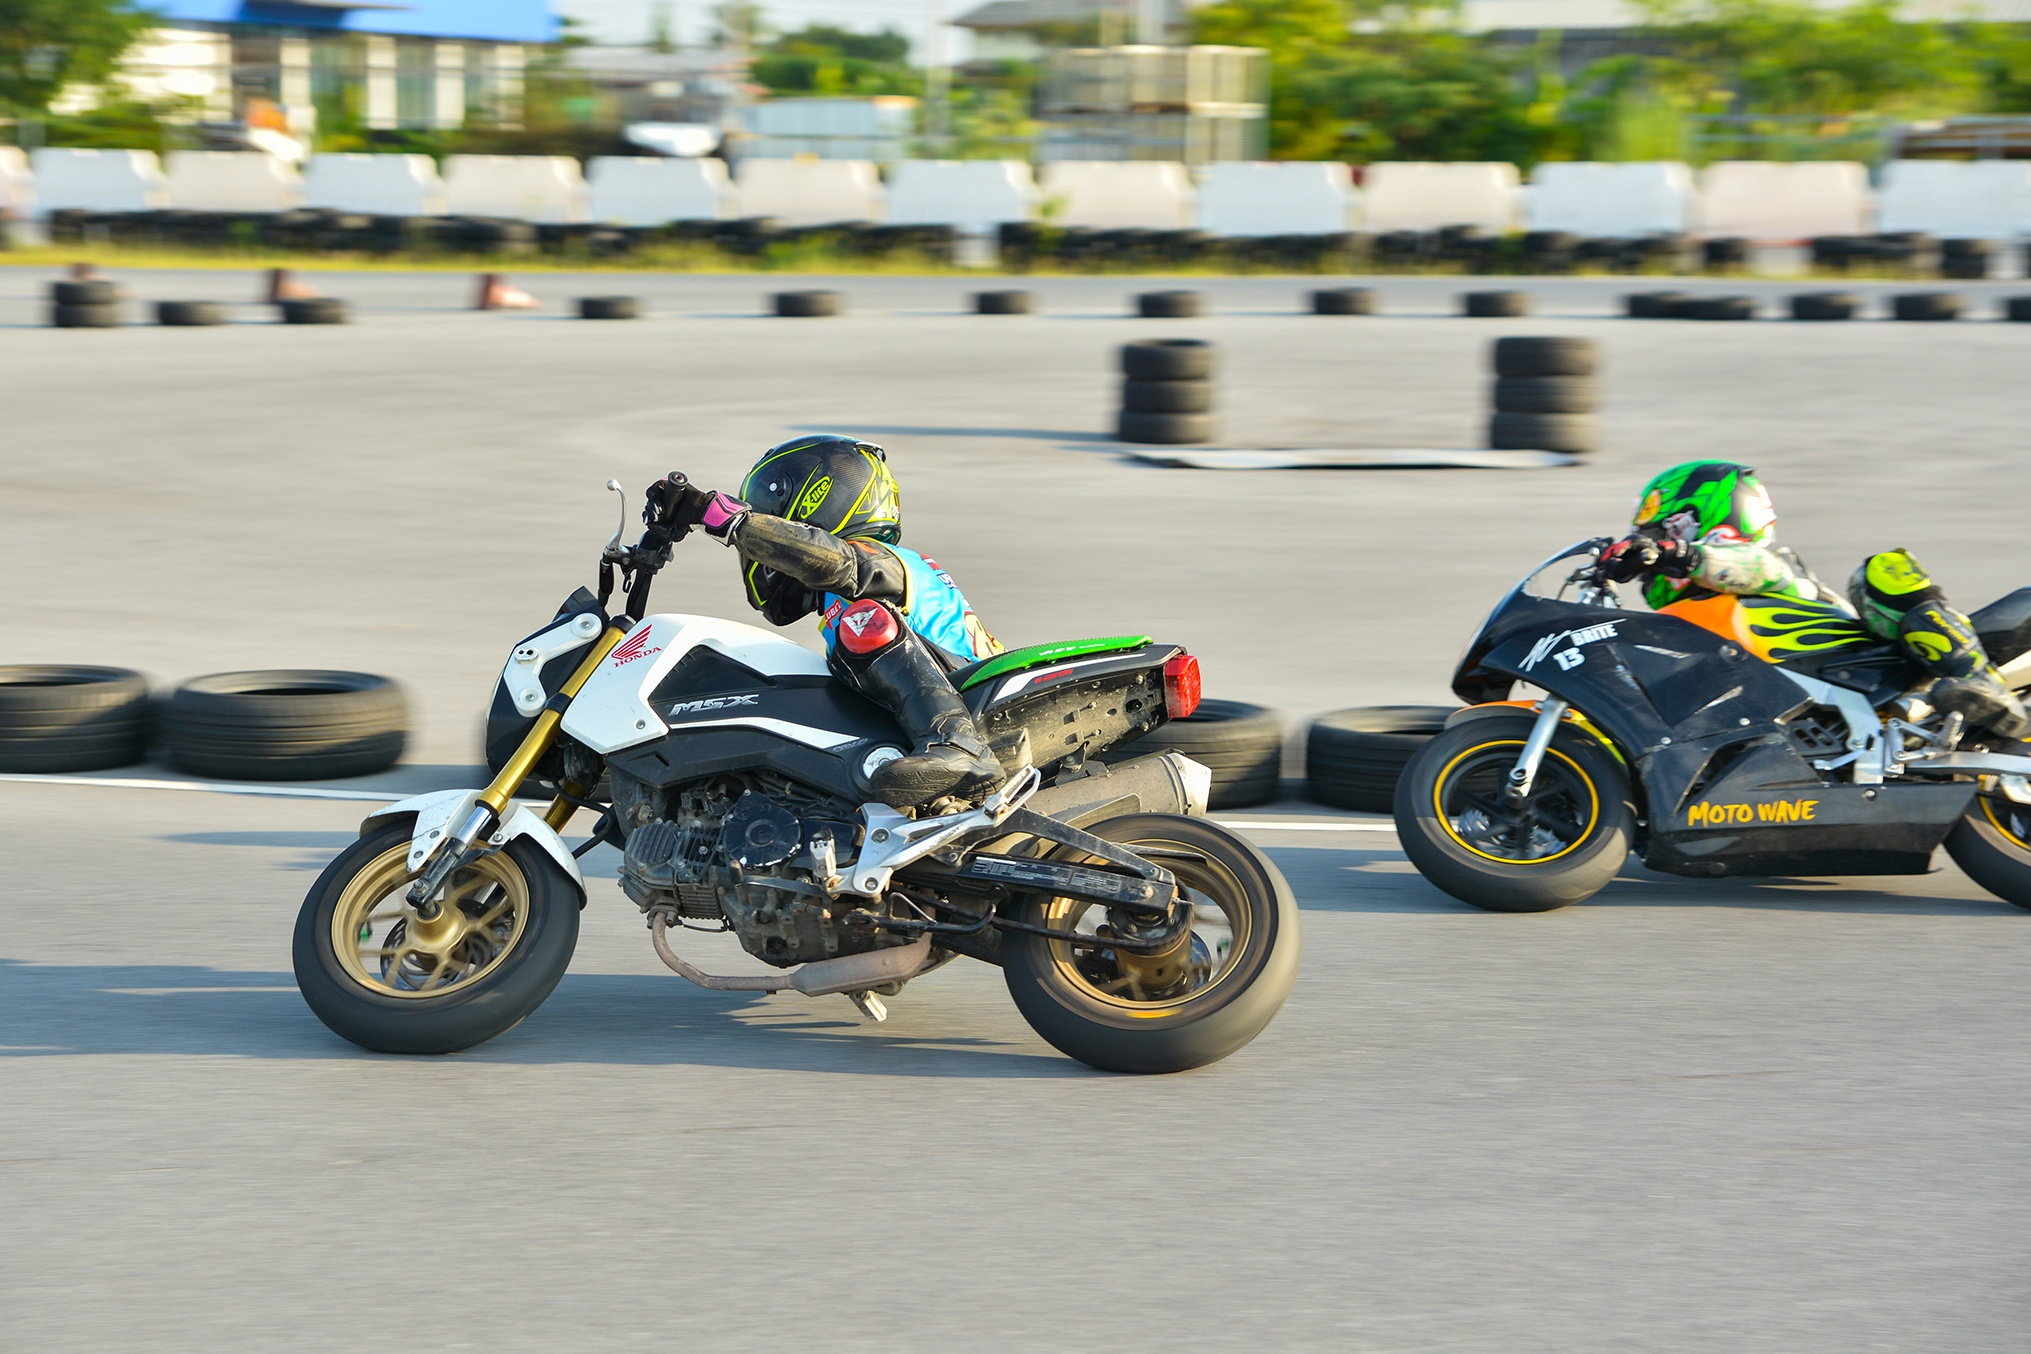 Giai dua moto tre em o Thai Lan va nhung giac mo MotoGP hinh anh 29